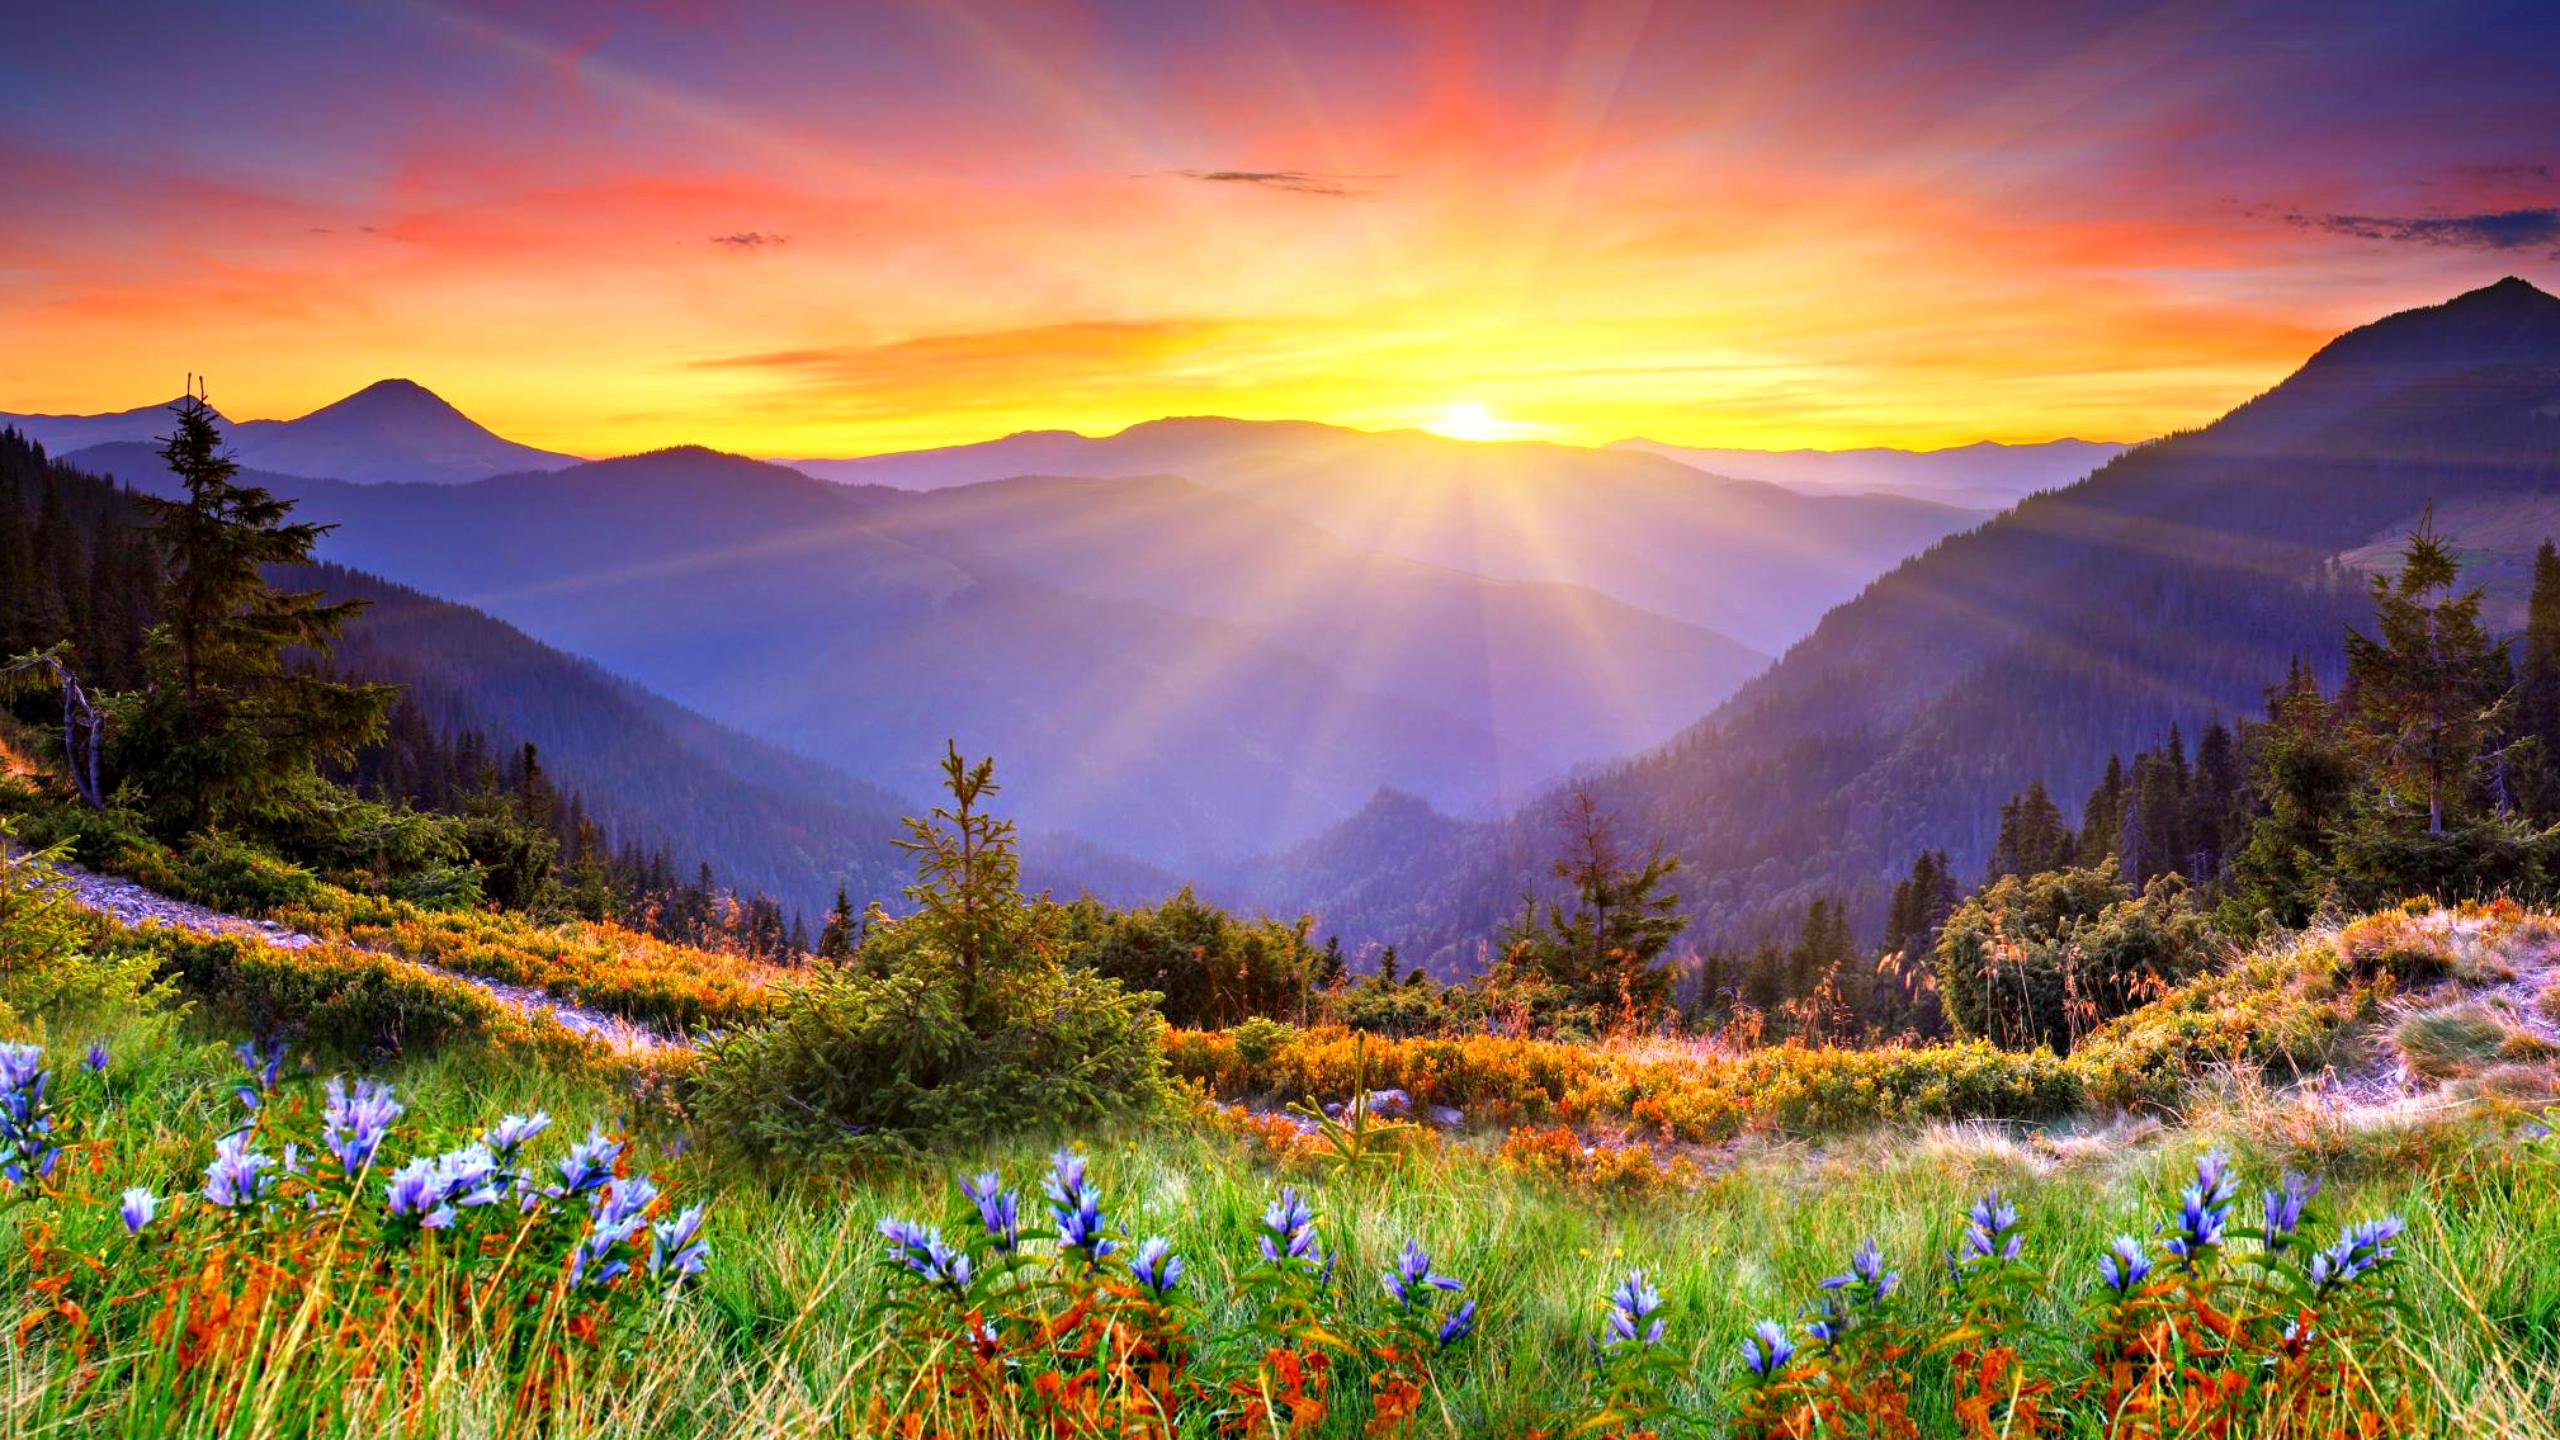 https://i0.wp.com/blog.hdwallsource.com/wp-content/uploads/2014/11/beautiful-sunrise-wallpaper-34171-34940-hd-wallpapers.jpg